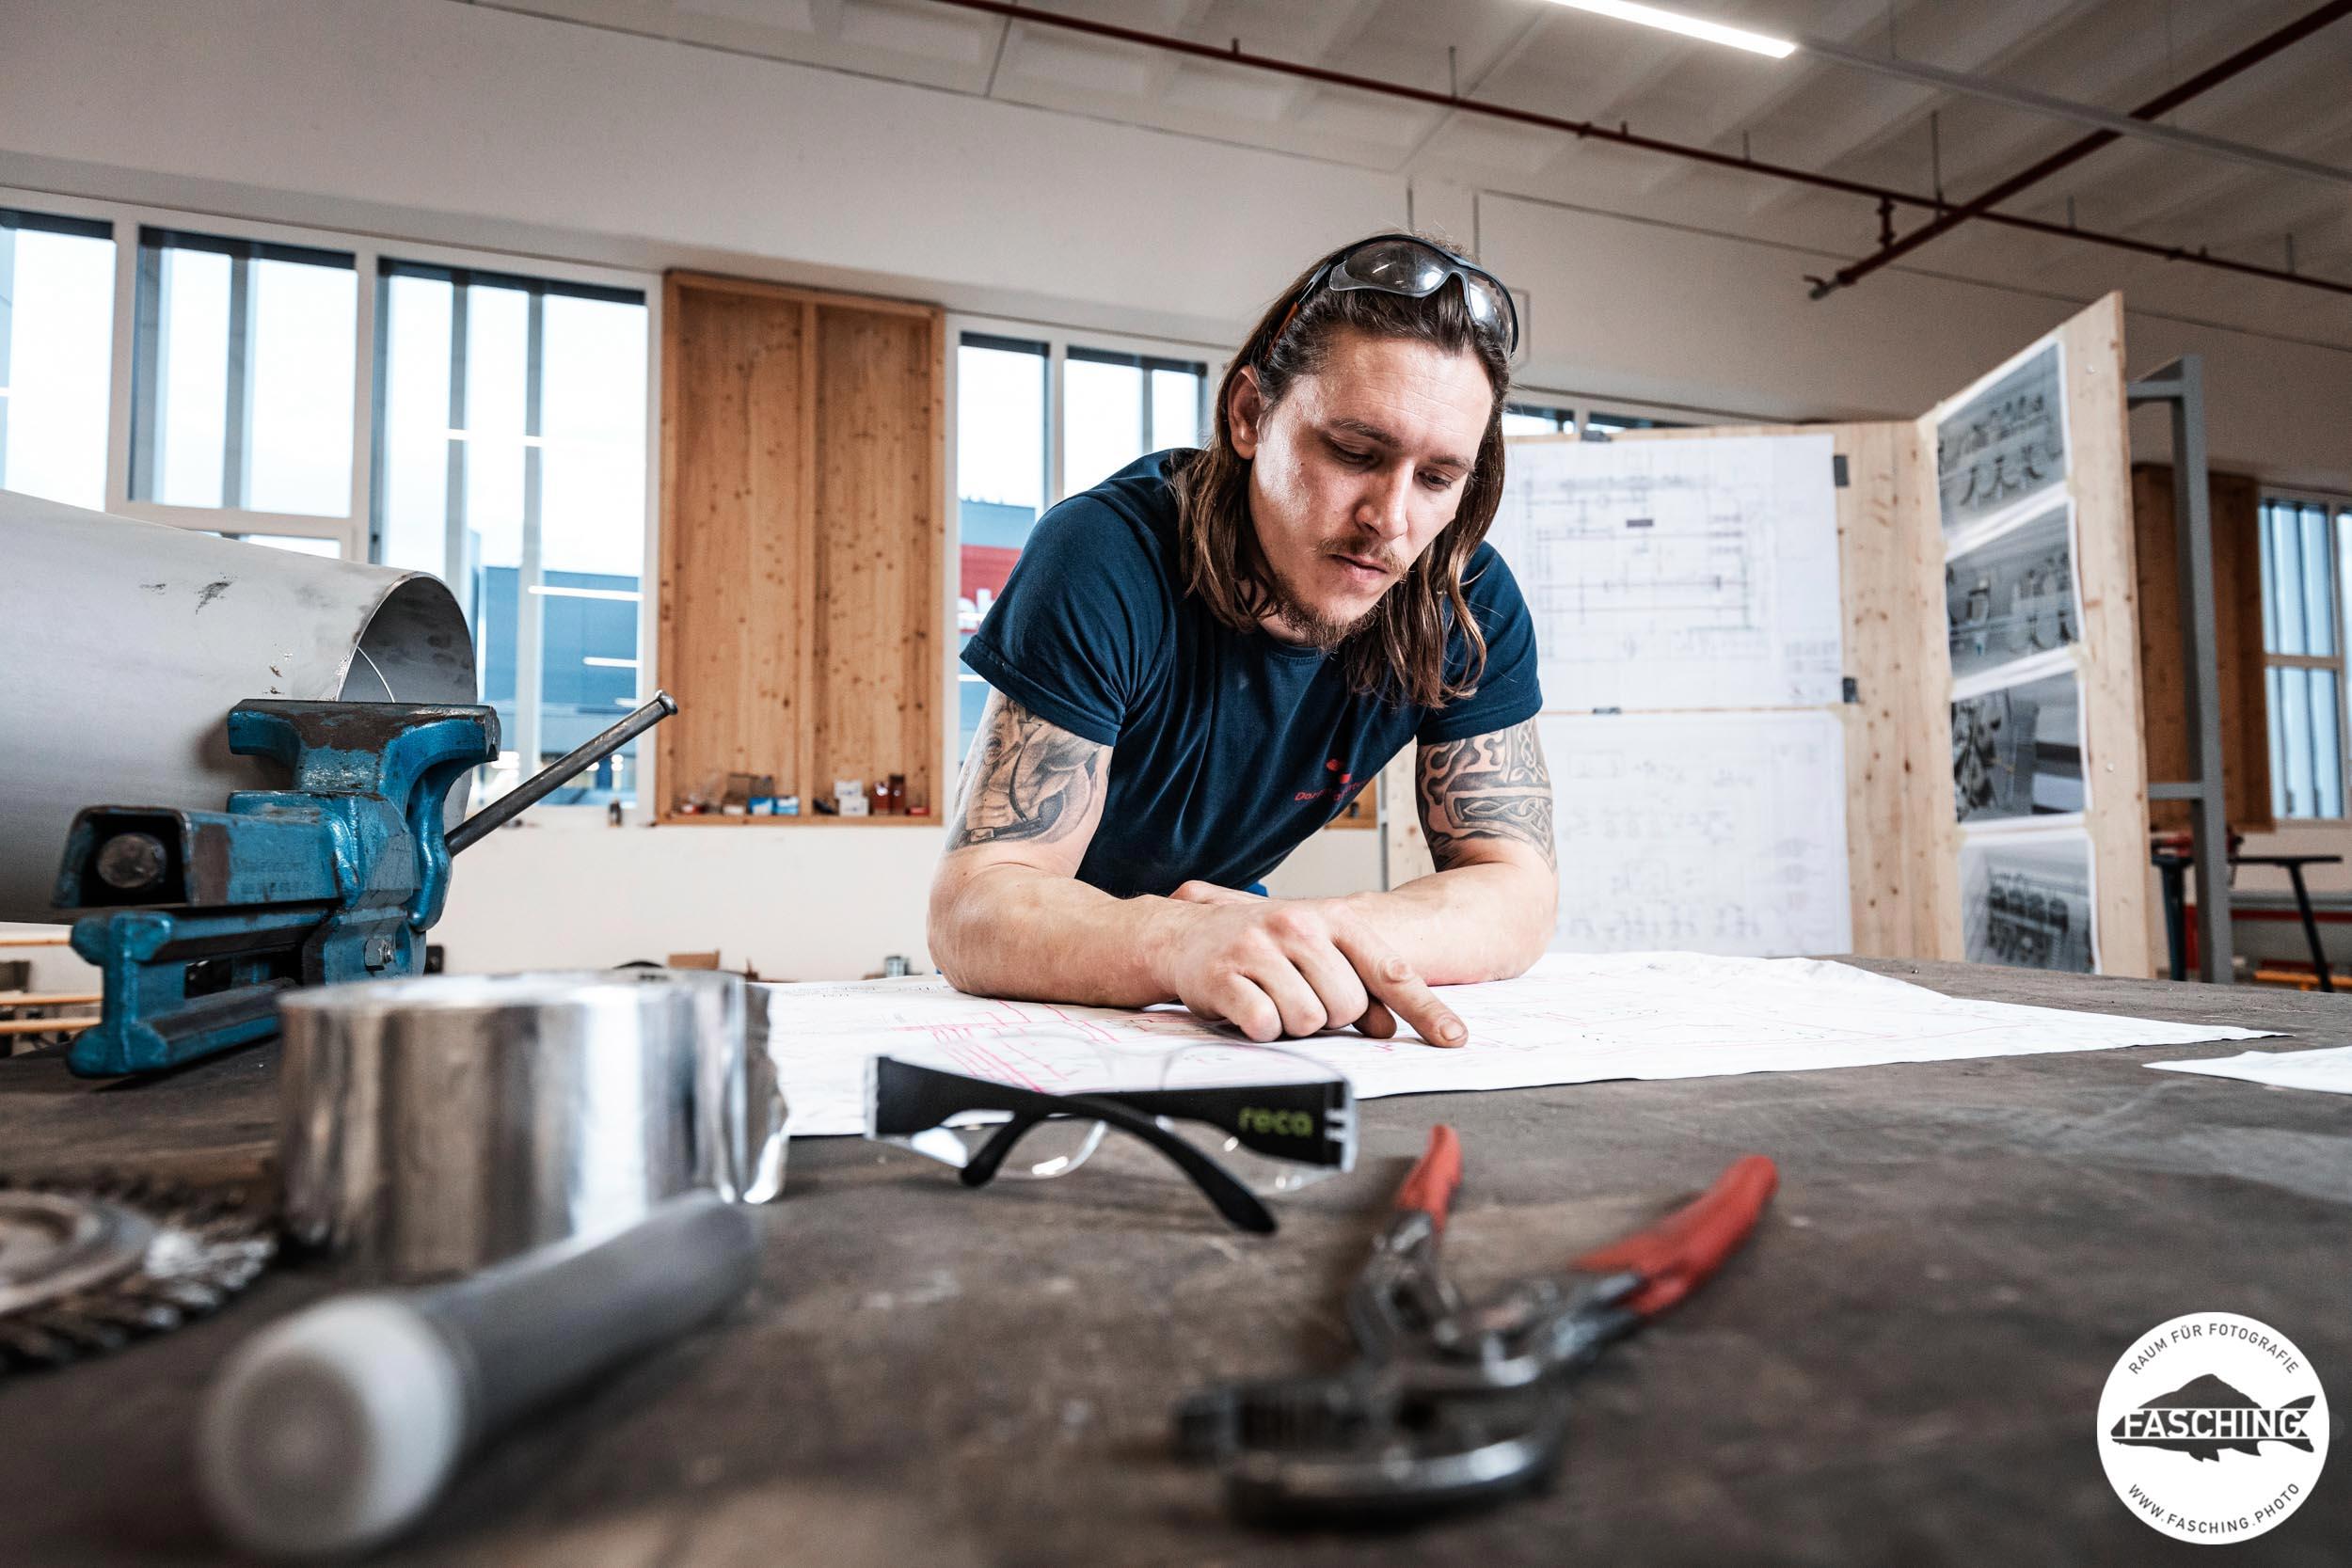 Luca Fasching hat einen Installateur beim Arbeiten fotografiert